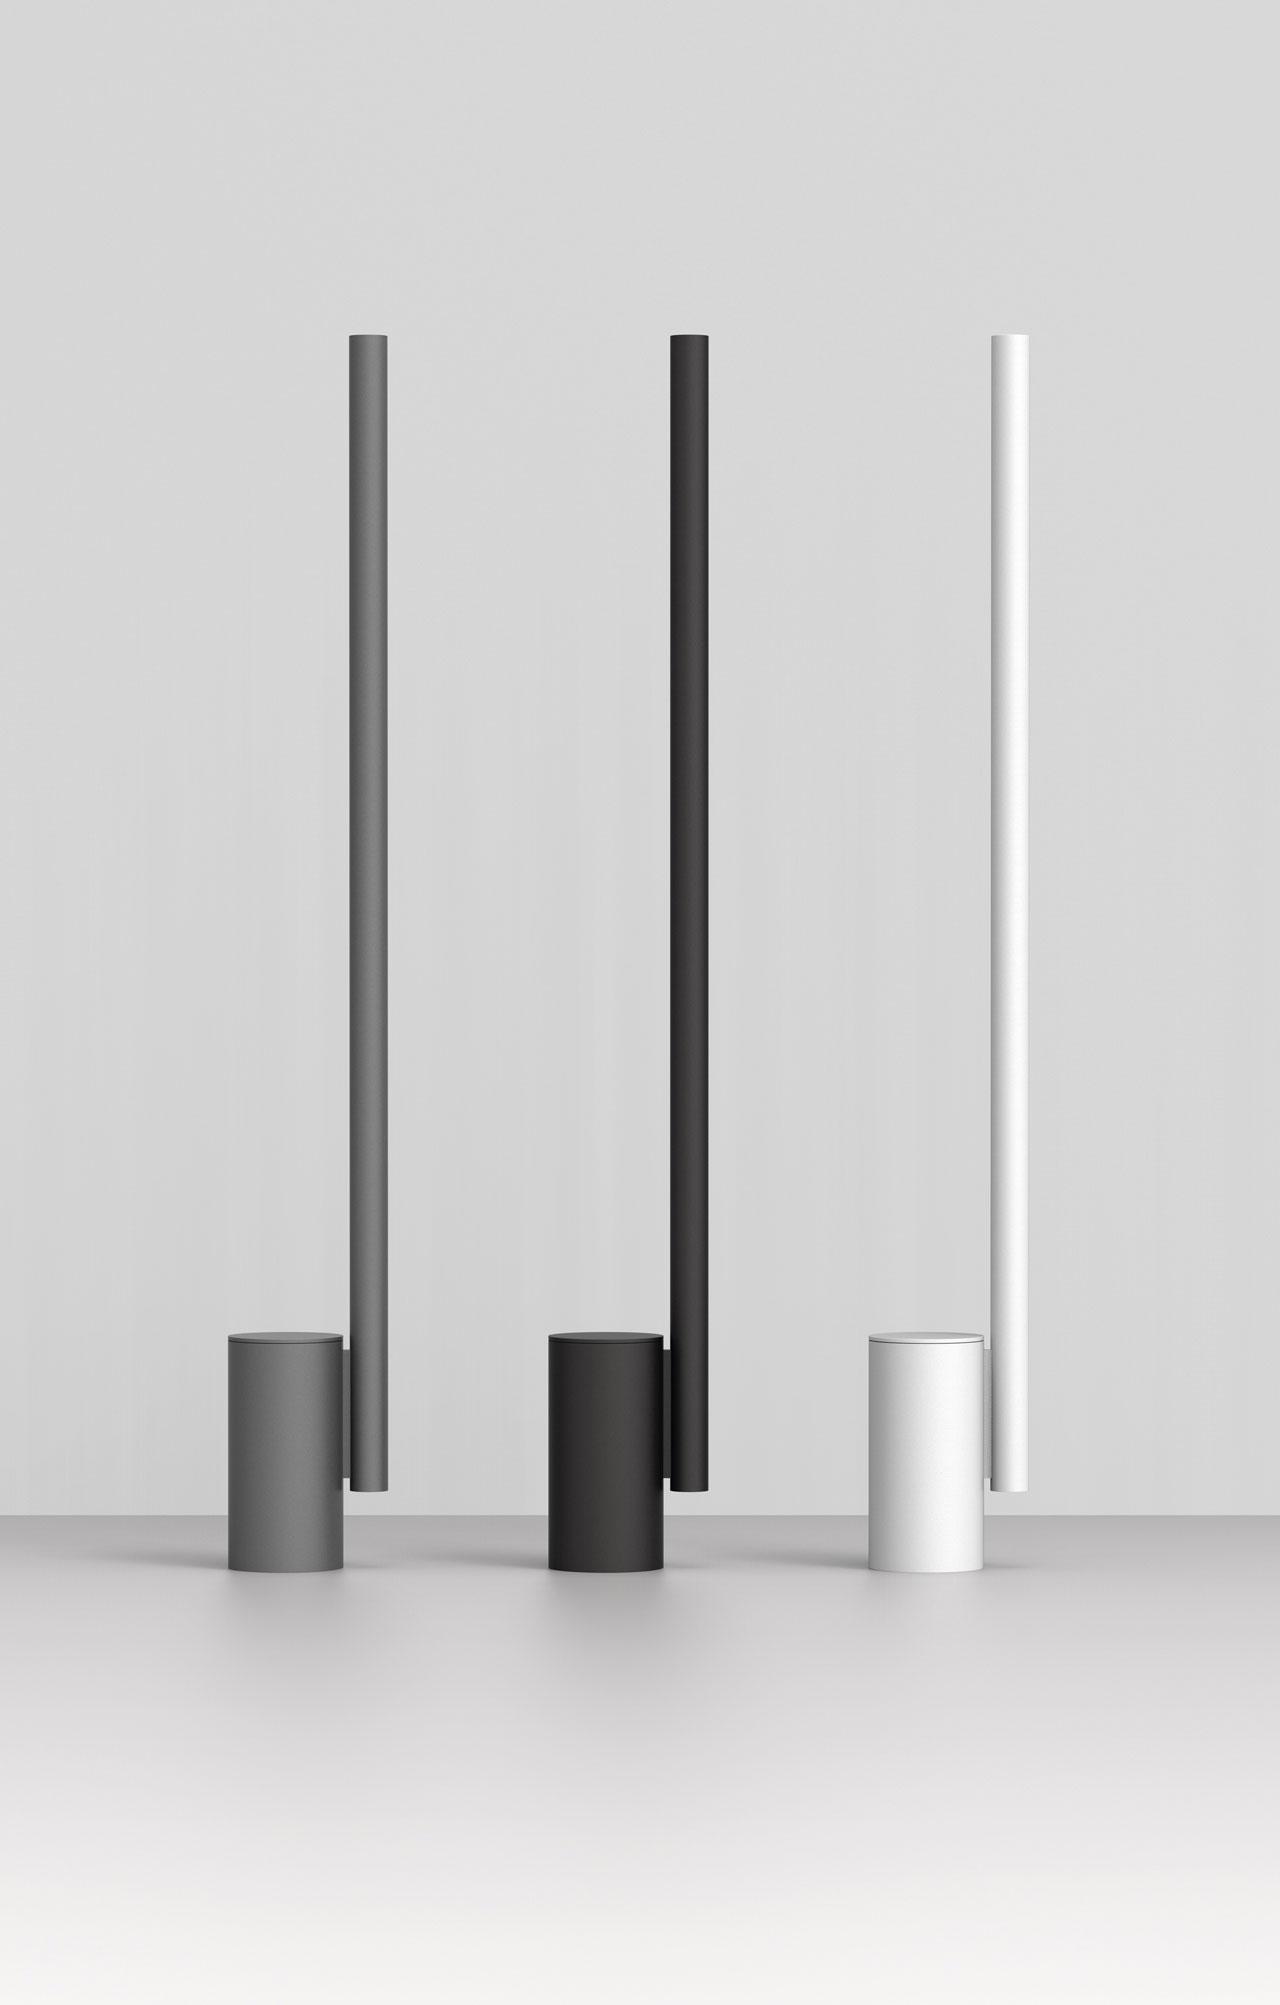 Thew164 Altohigh-tech uplighter by Wästbergin collaboration with Dirk Winkel.